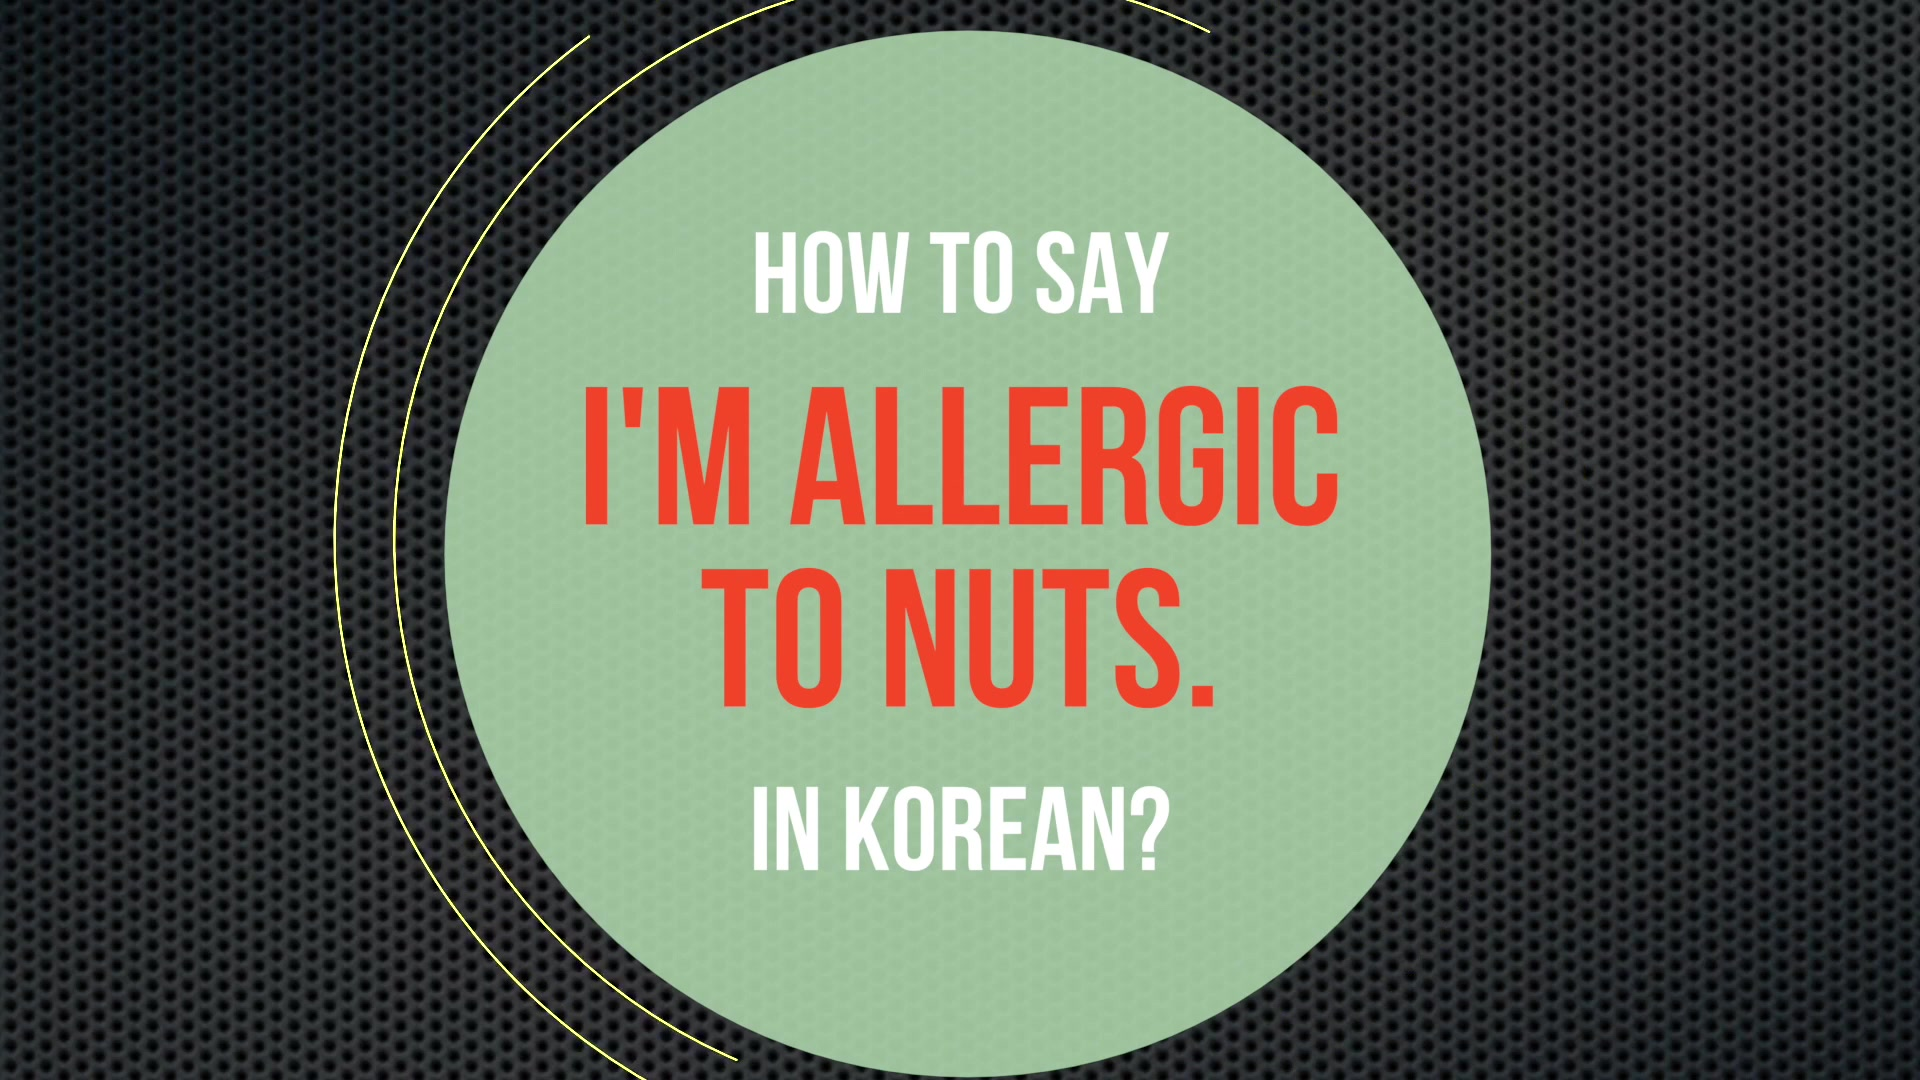 TalkToMeInKorean Episode 124: One-Minute Korean: 'I'm Allergic to Nuts.'